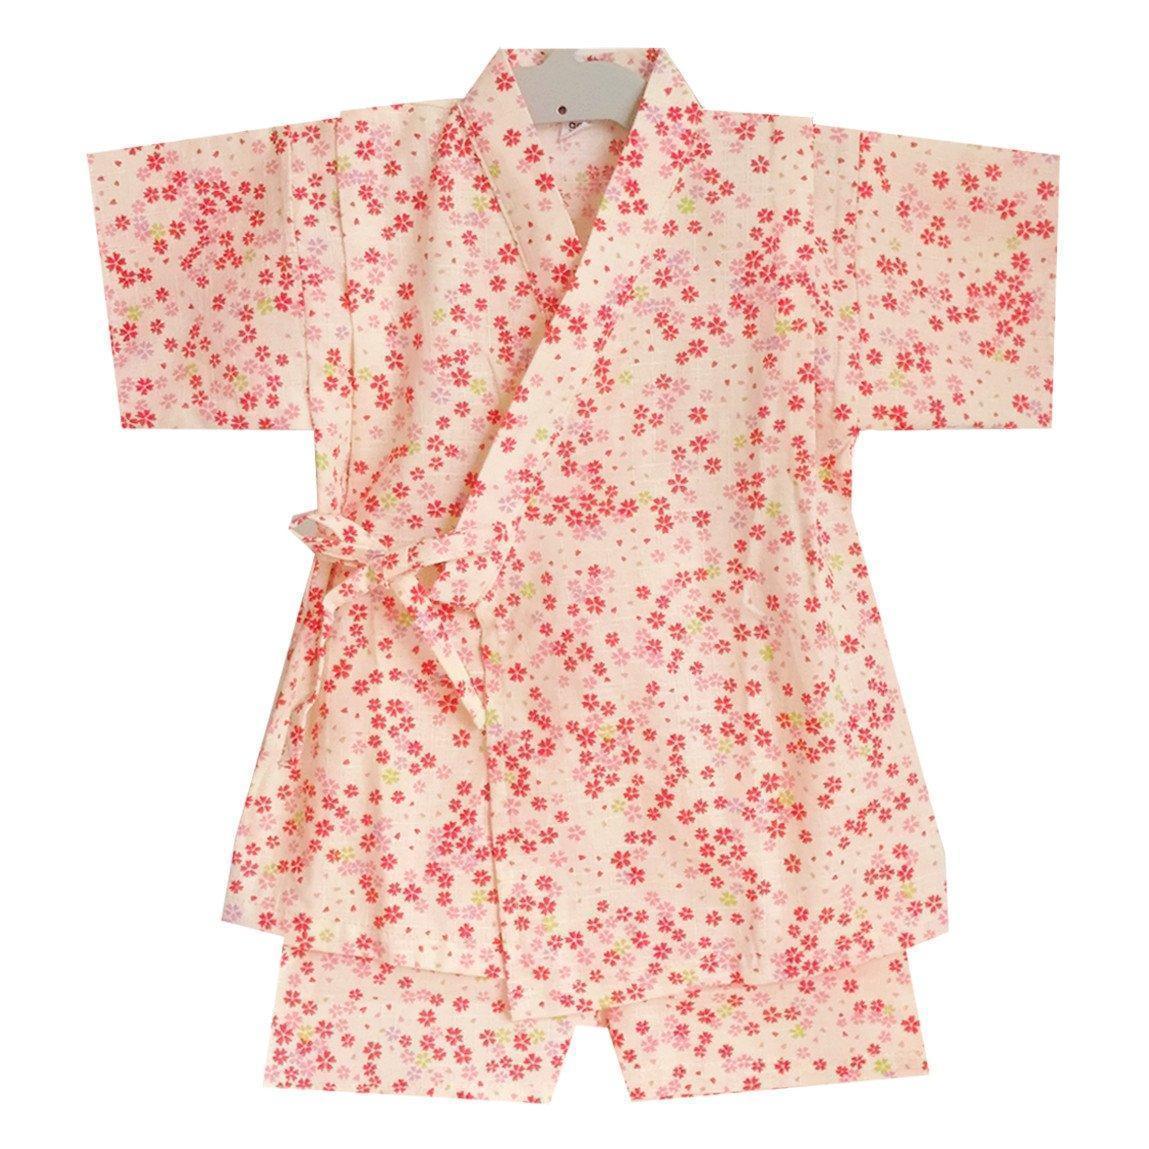 Okiddo Little Japanese Sakura Girl Suit-Beige By Okiddo.